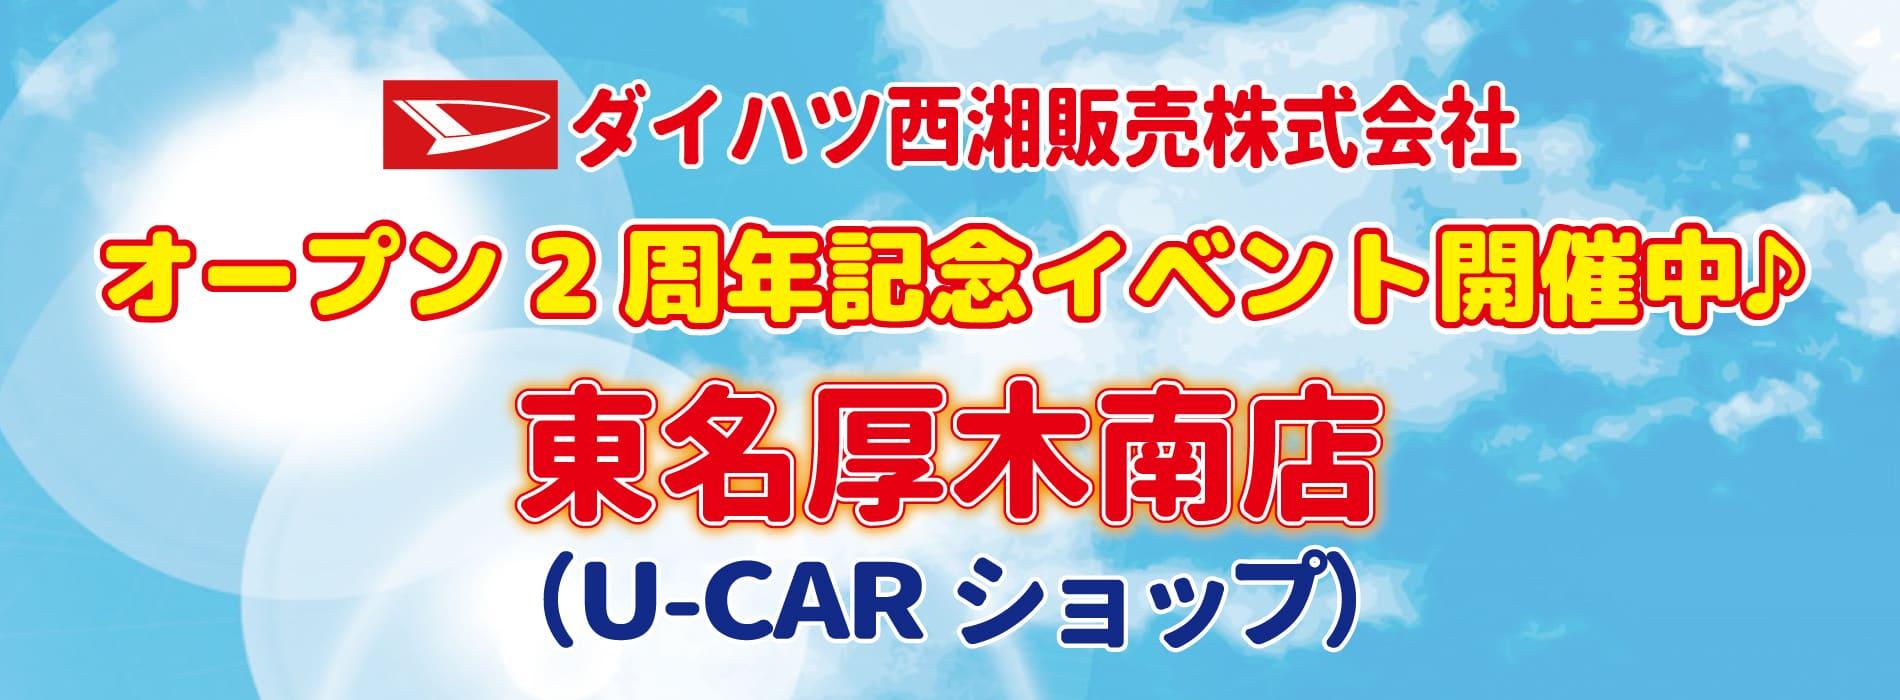 東名厚木店オープン2周年記念